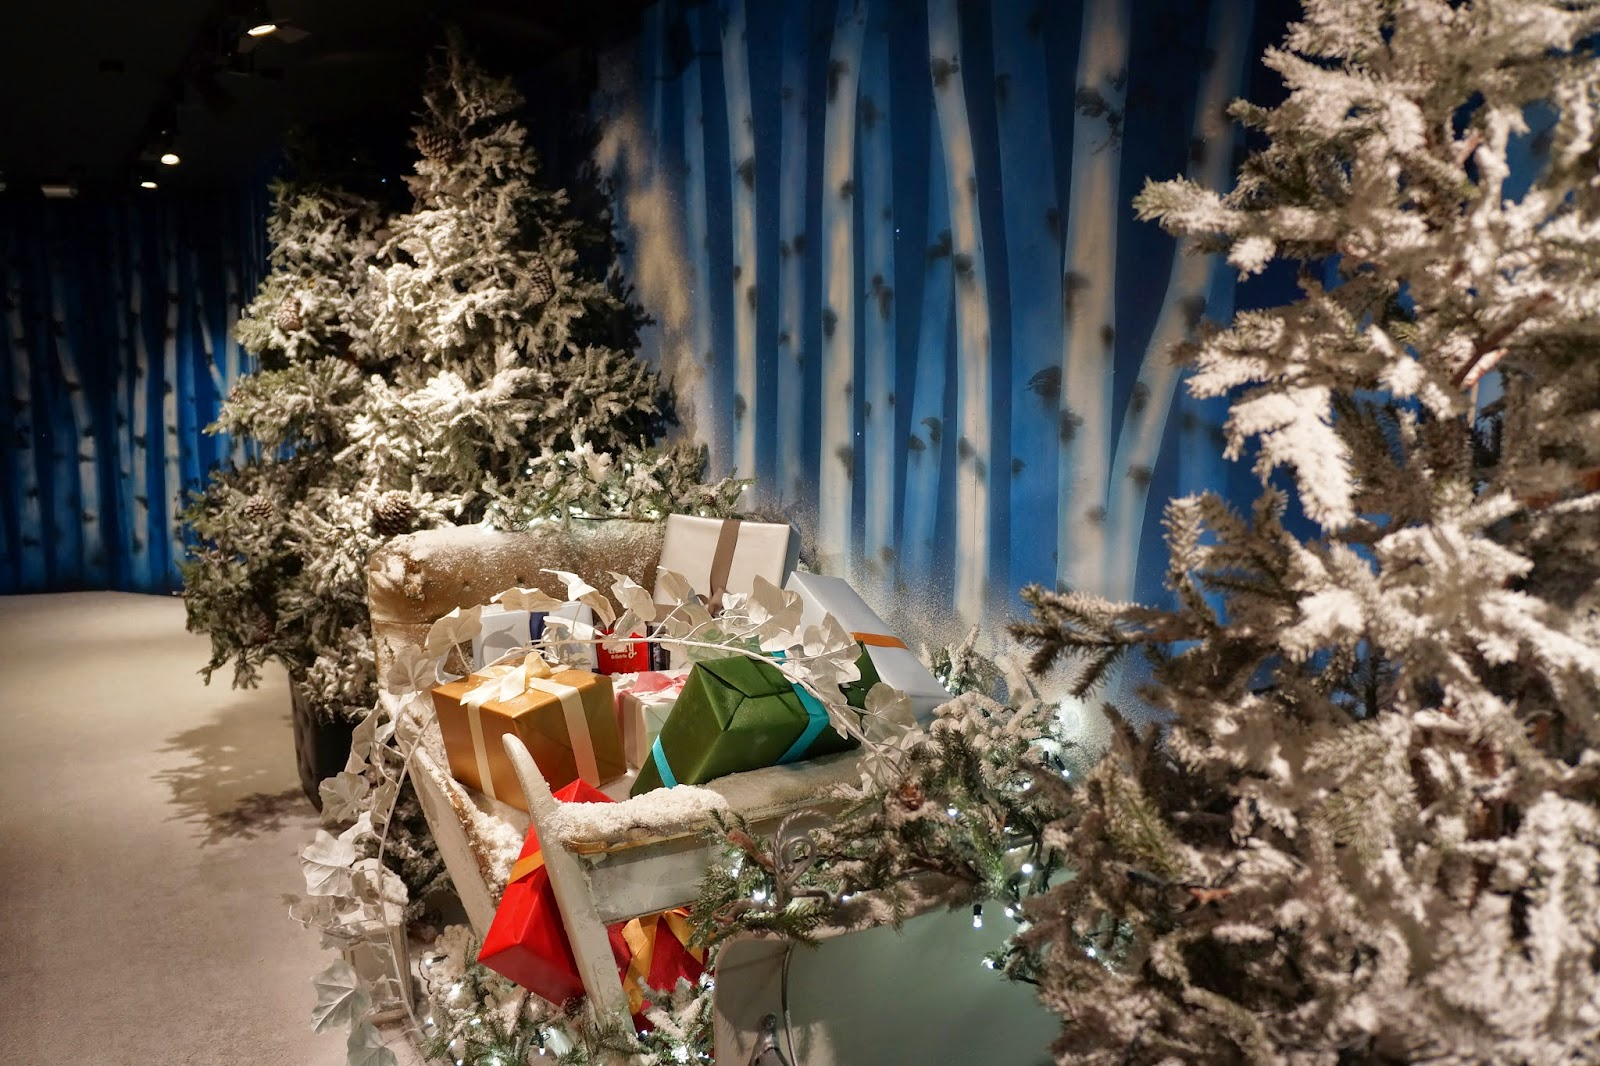 harrods christmas santa's grotto 2014 gift sleigh